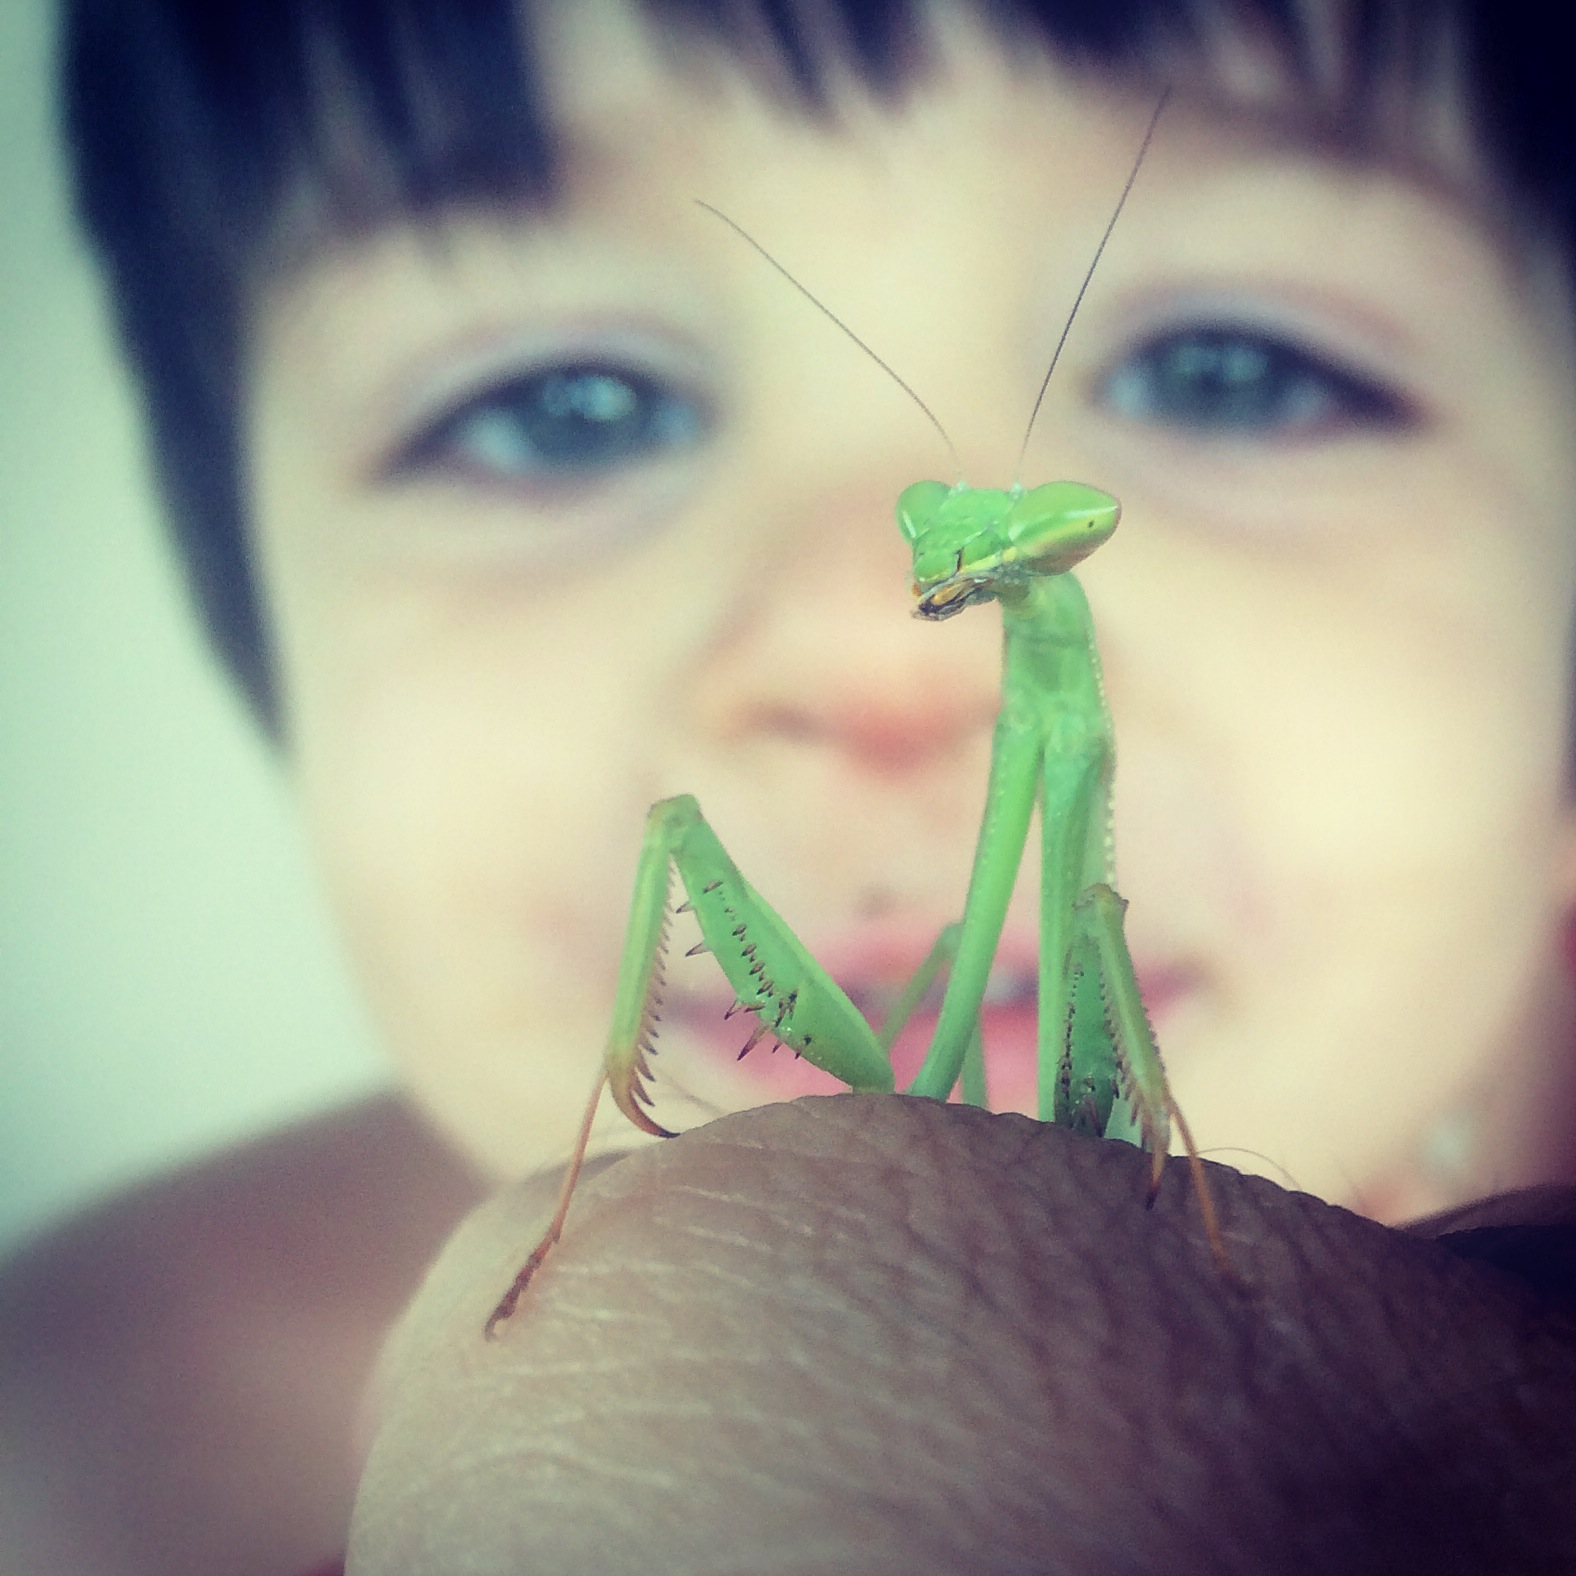 Noah Meets The Praying Mantis by micahgoulart